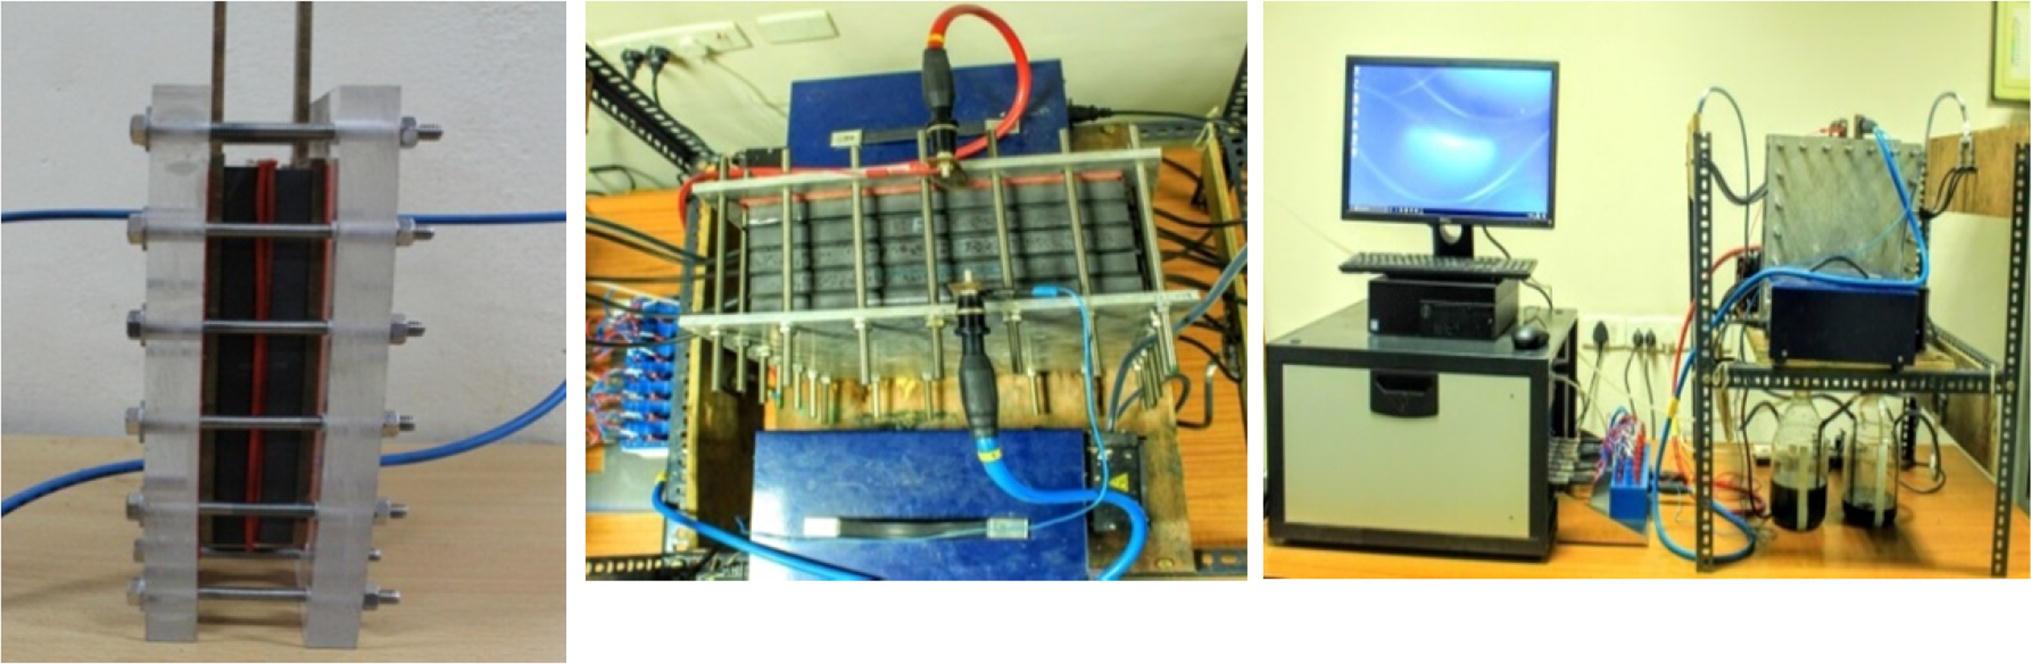 Stack Design Considerations for Vanadium Redox Flow Battery